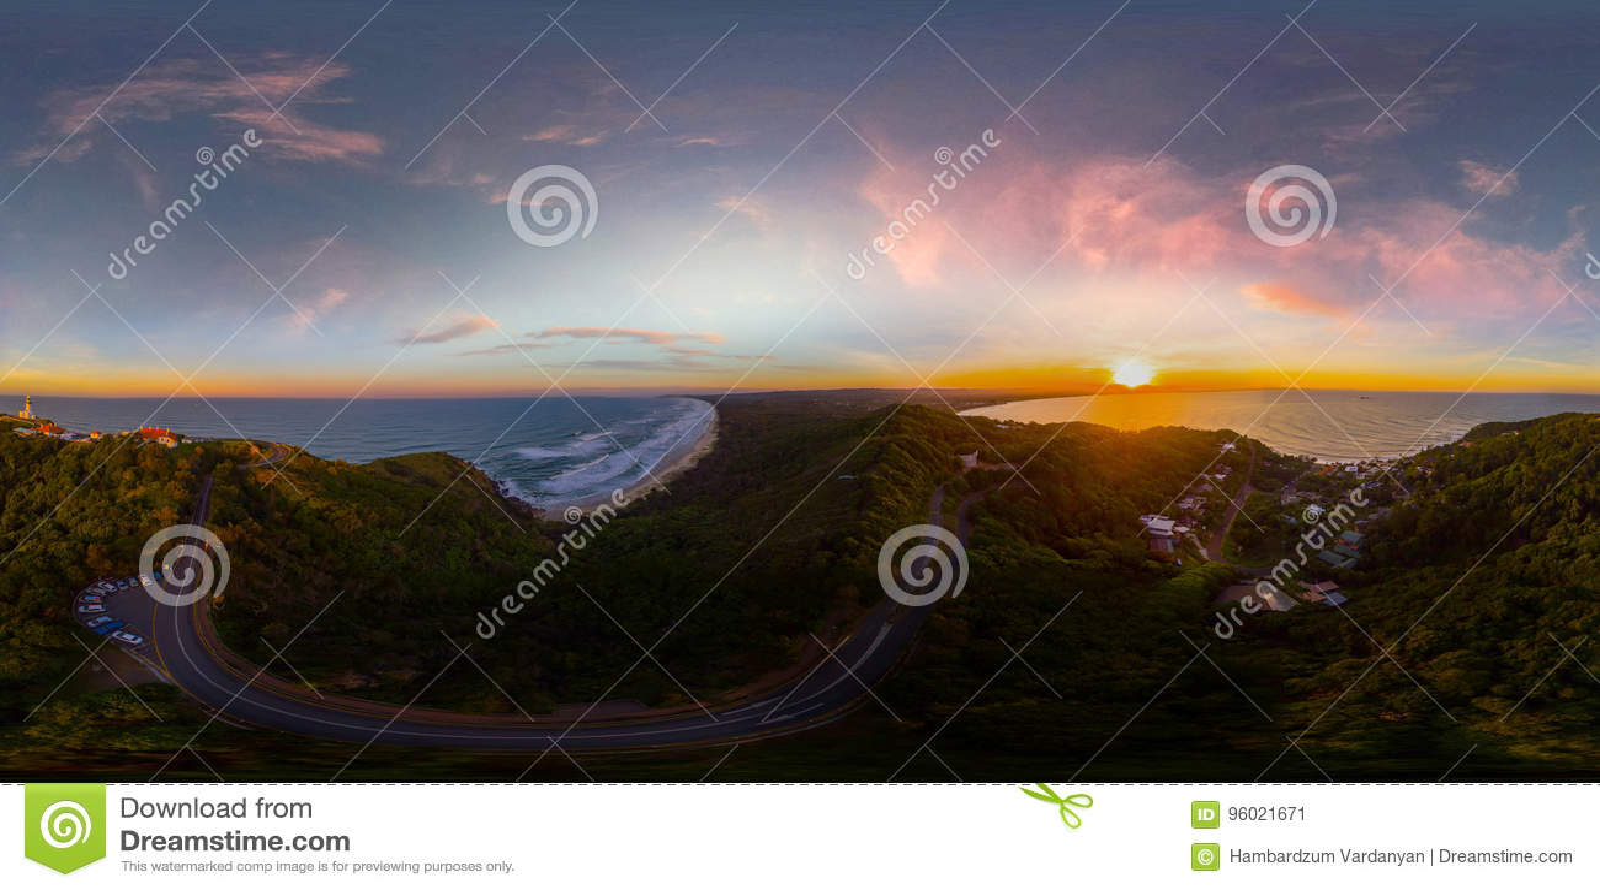 Beach Sunrise 360 Degree Vr Panorama Stock Image - Image of